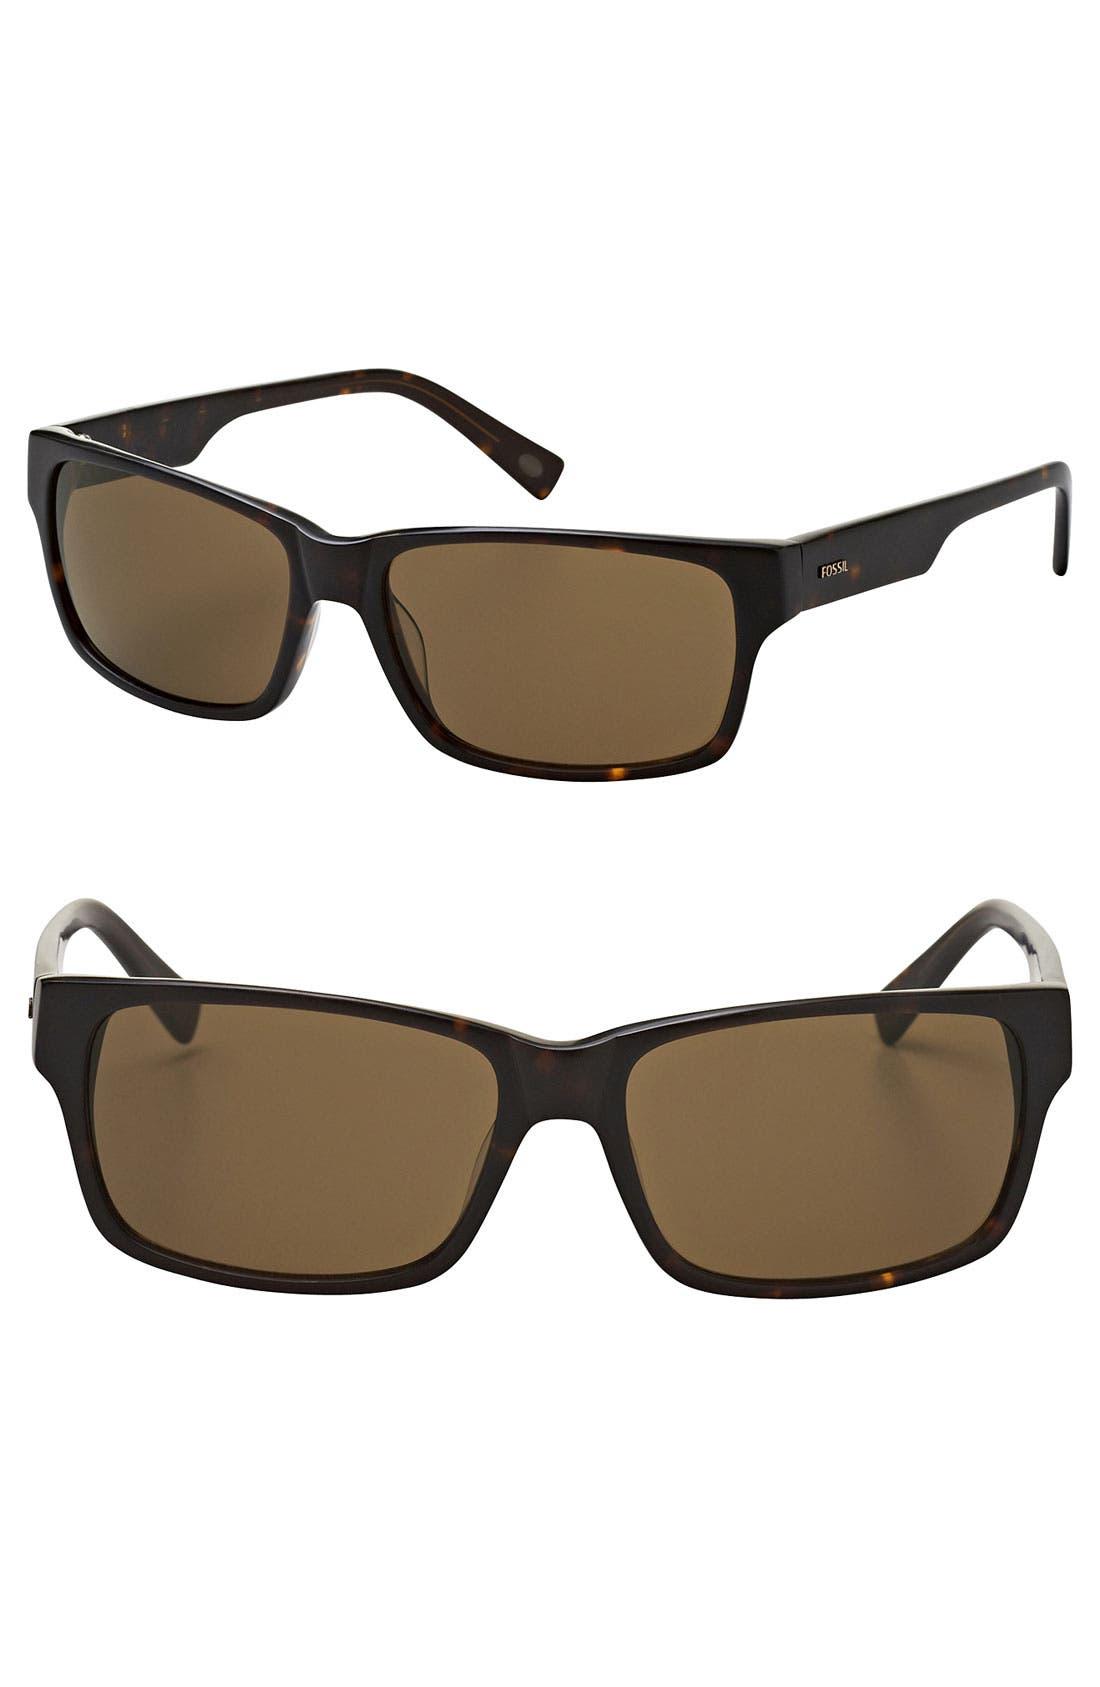 Alternate Image 1 Selected - Fossil 'Jackson' 60mm Polarized Sunglasses